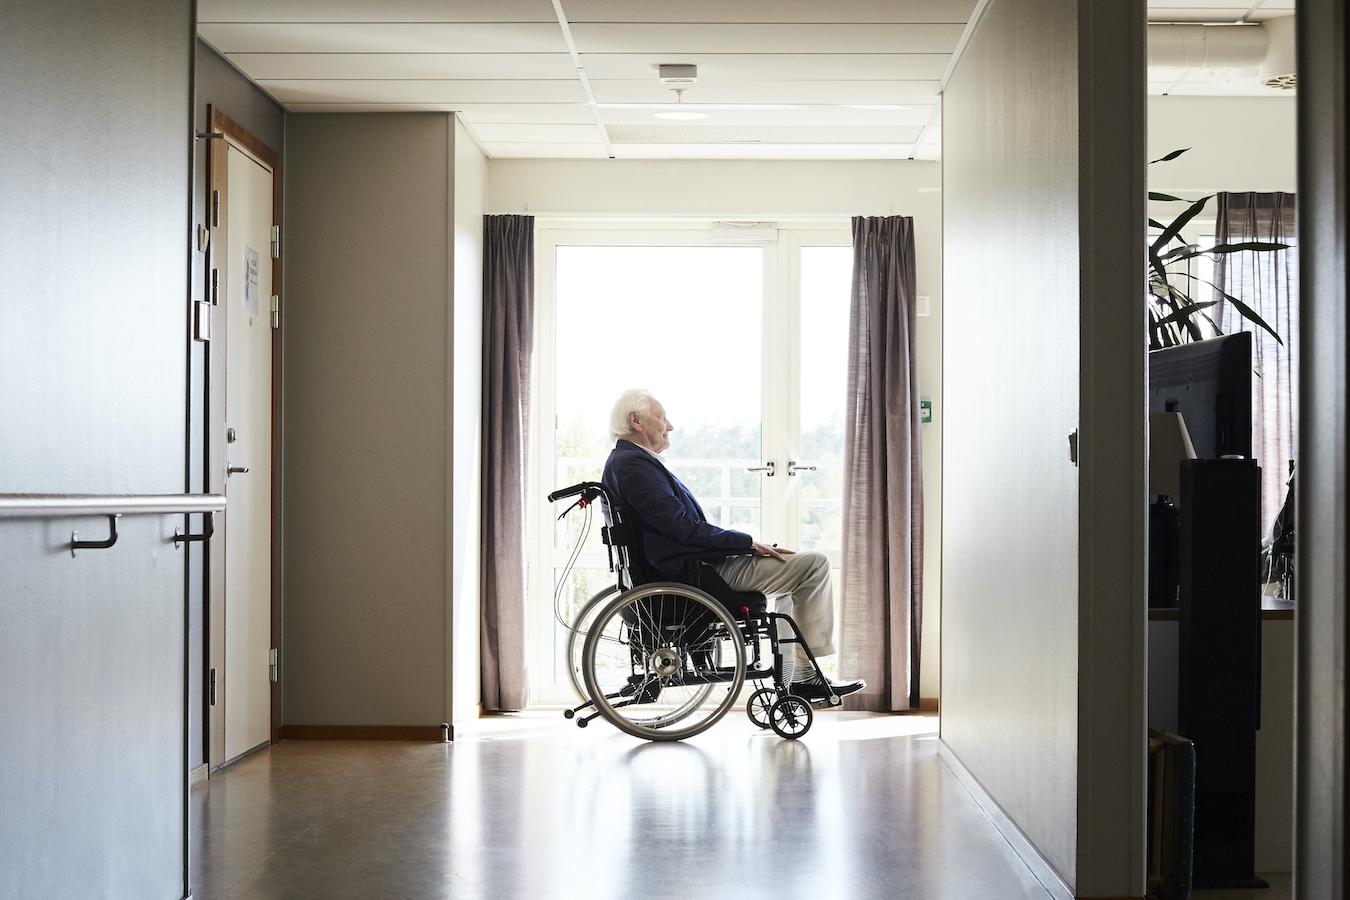 khn.org - Susan Jaffe - 3 States Limit Nursing Home Profits in Bid to Improve Care